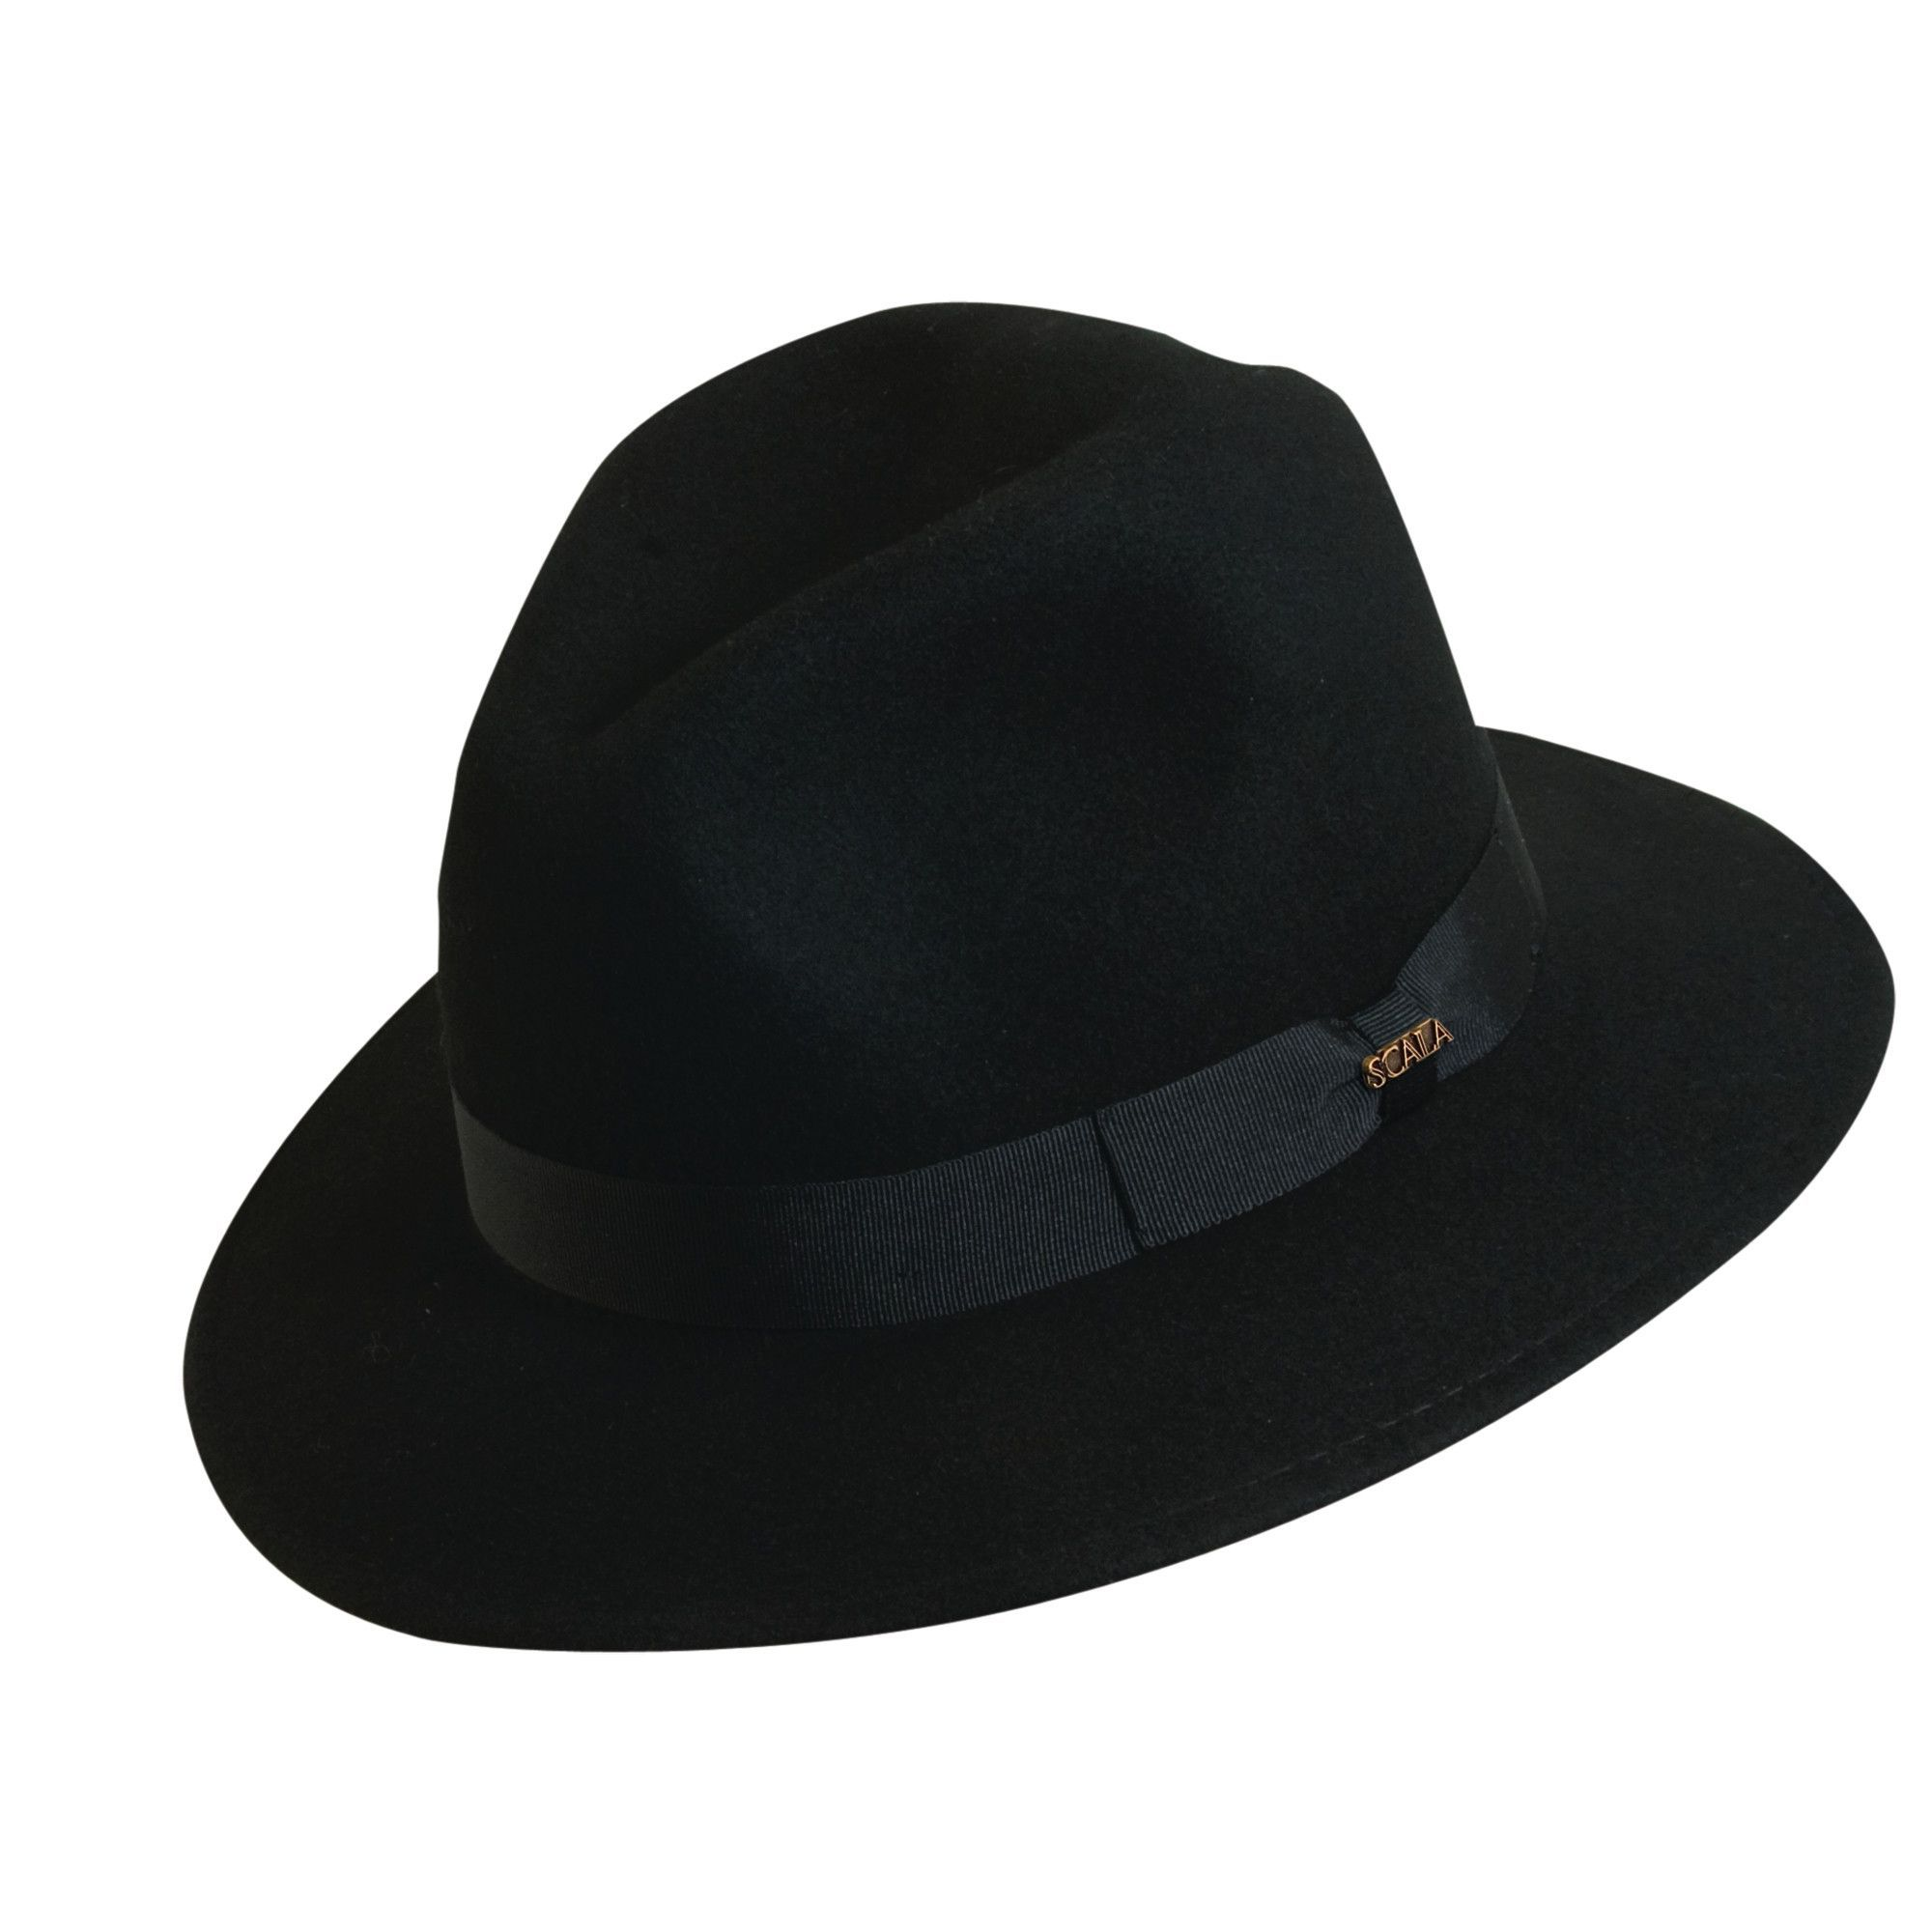 Scala Classico Men s 100% Wool Crushable Safari Hat  93644aa4609c